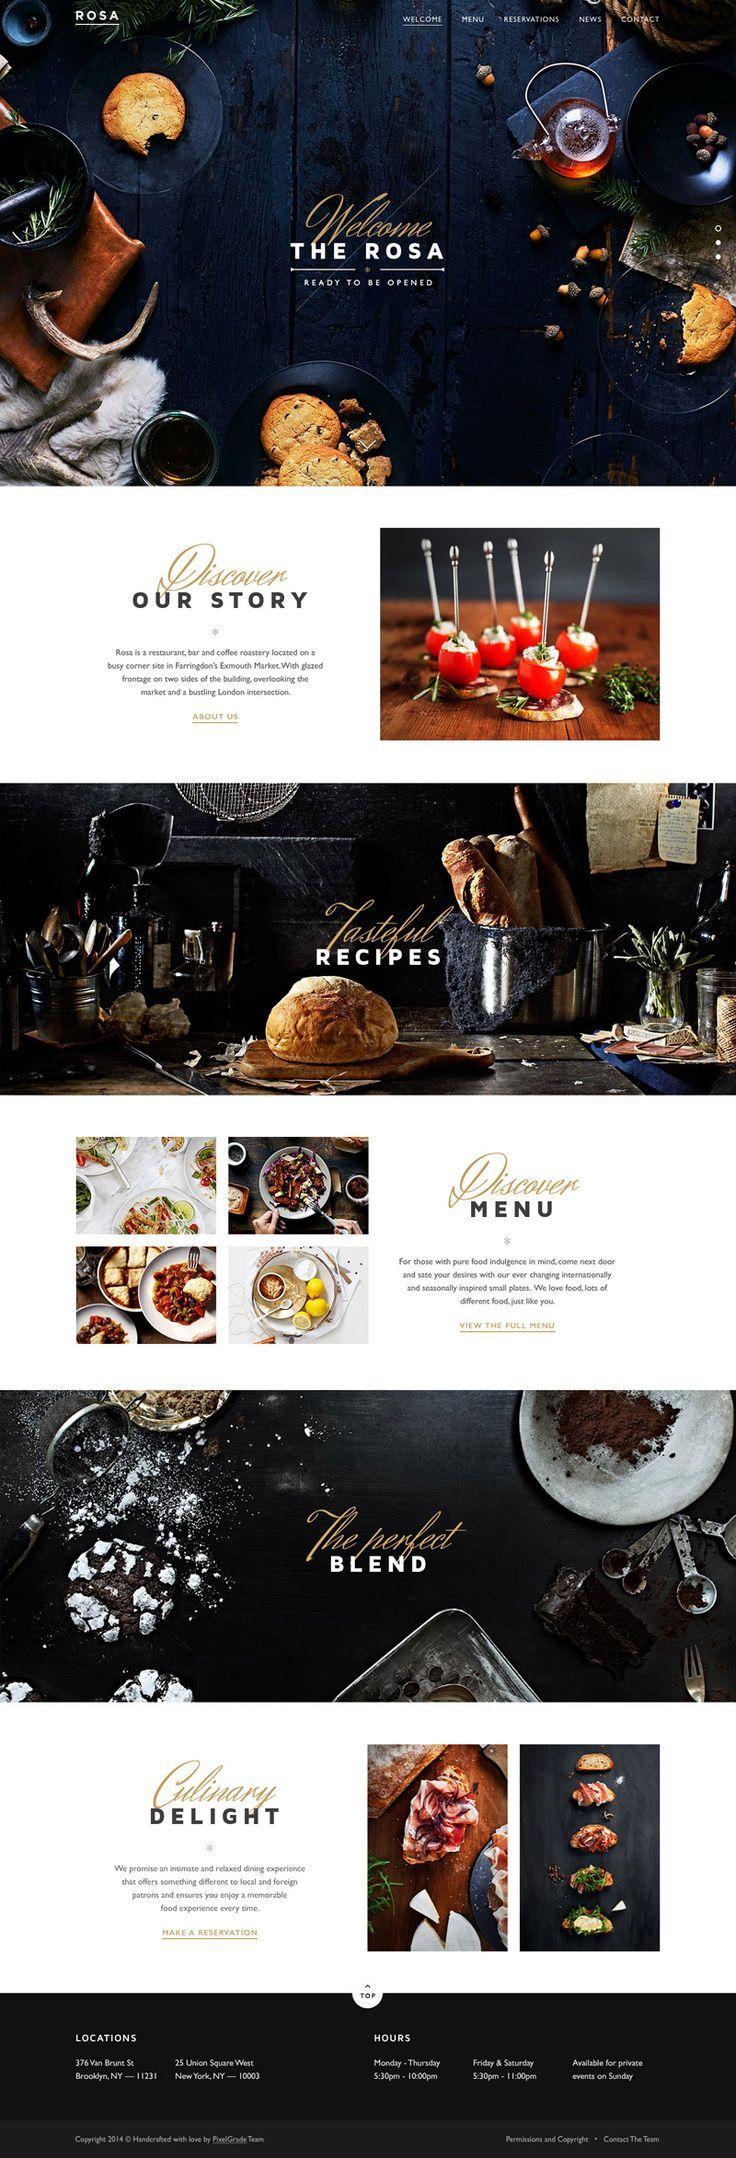 Rosa Website Design